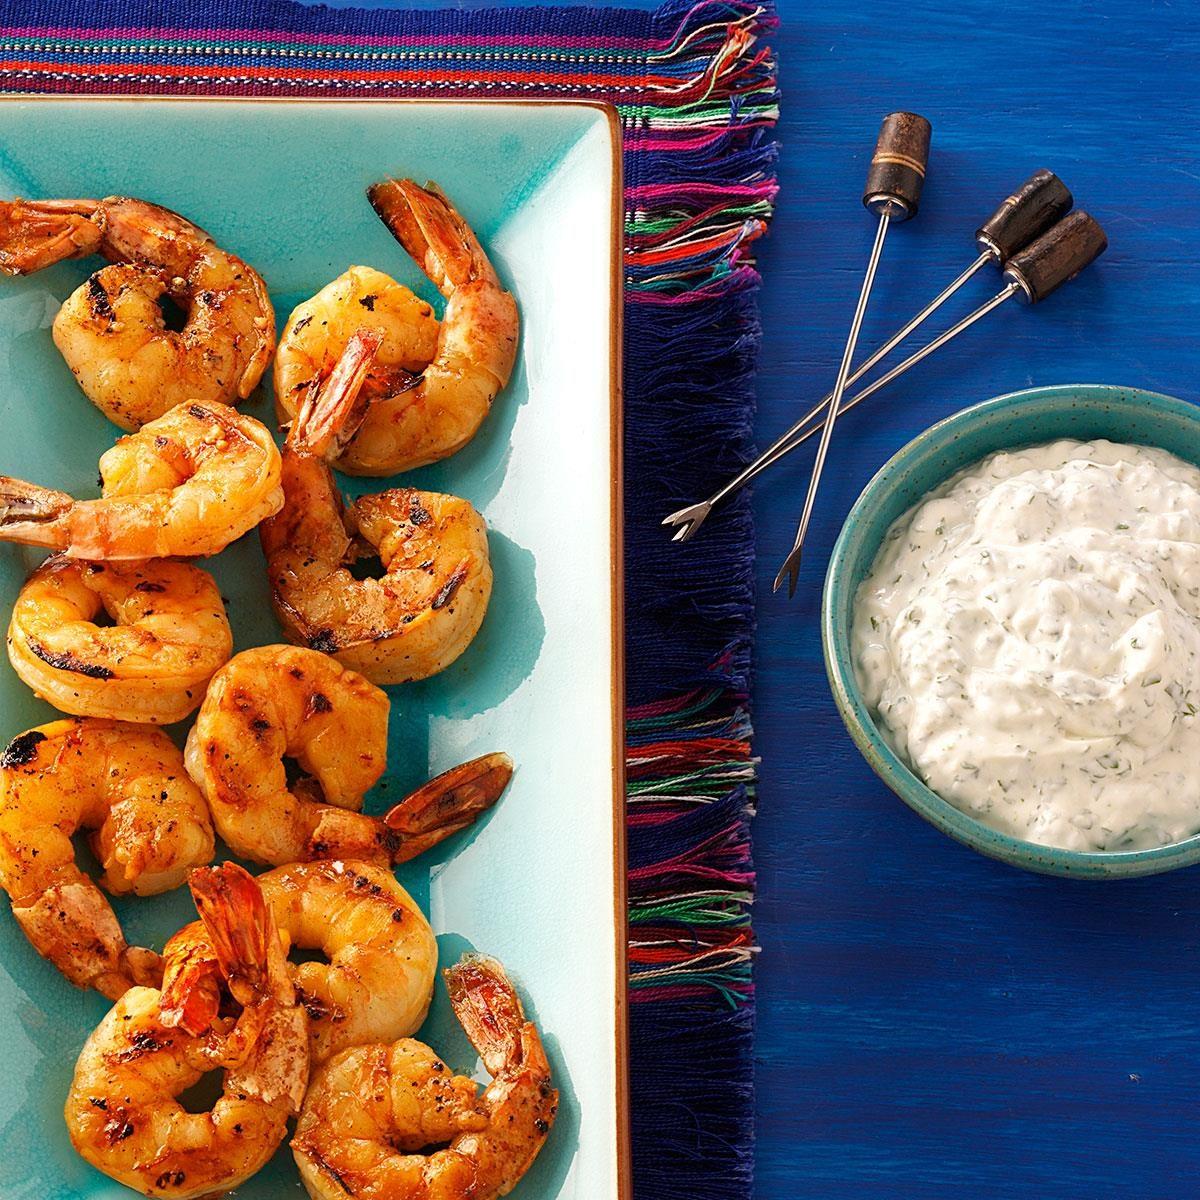 South Carolina: Grilled Chipotle Shrimp